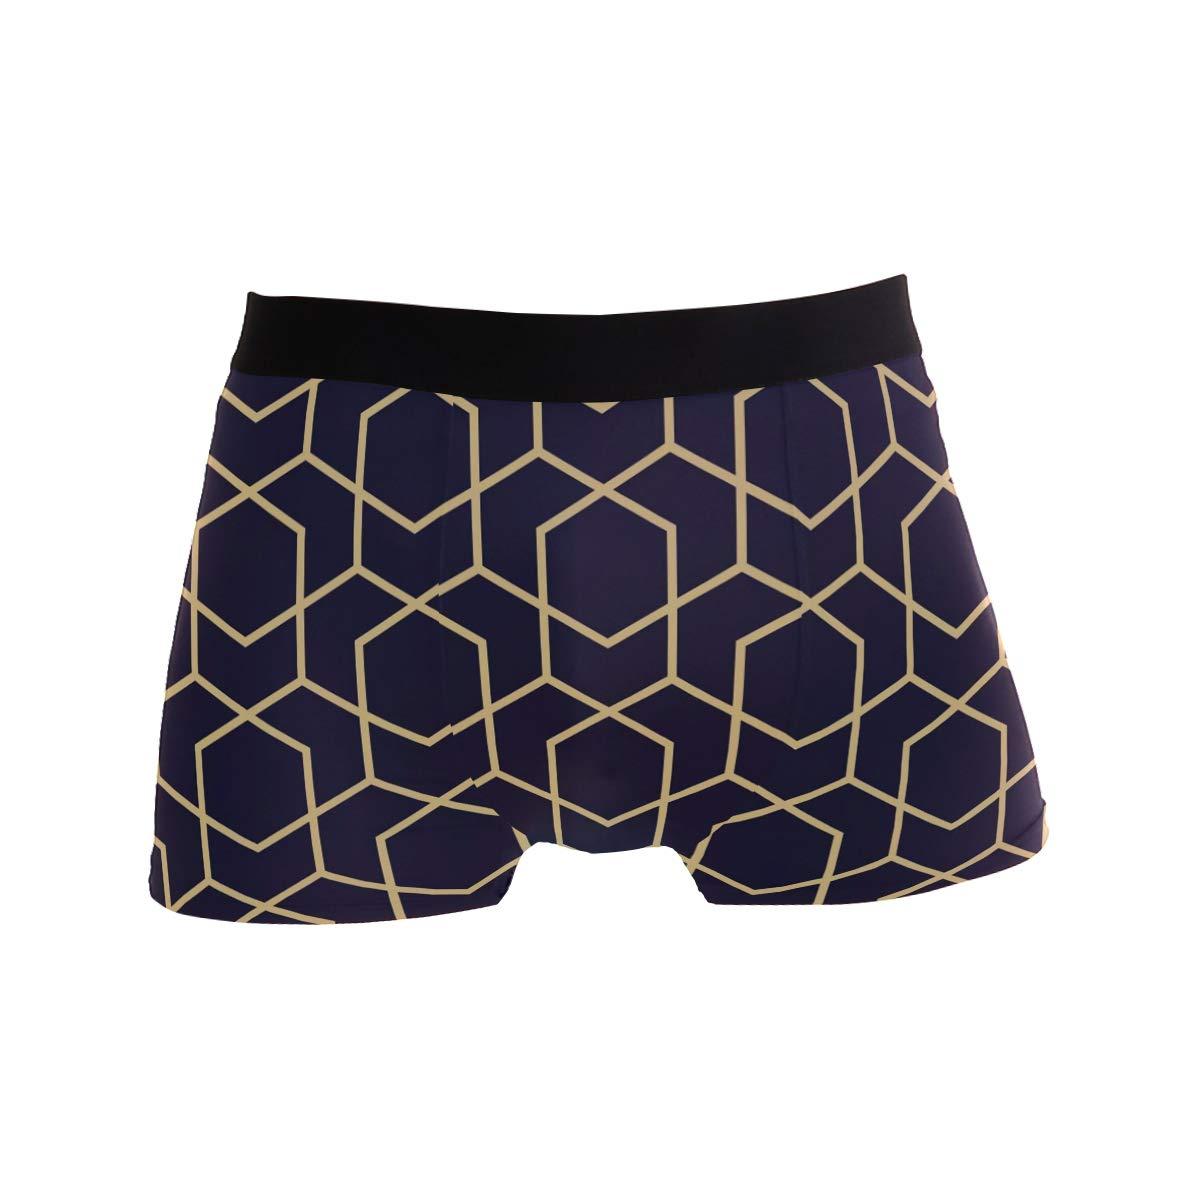 BETTKEN Mens Boxer Briefs Abstract Geometric Pattern Short Underwear Soft Stretch Underpants for Men Boys S-XL